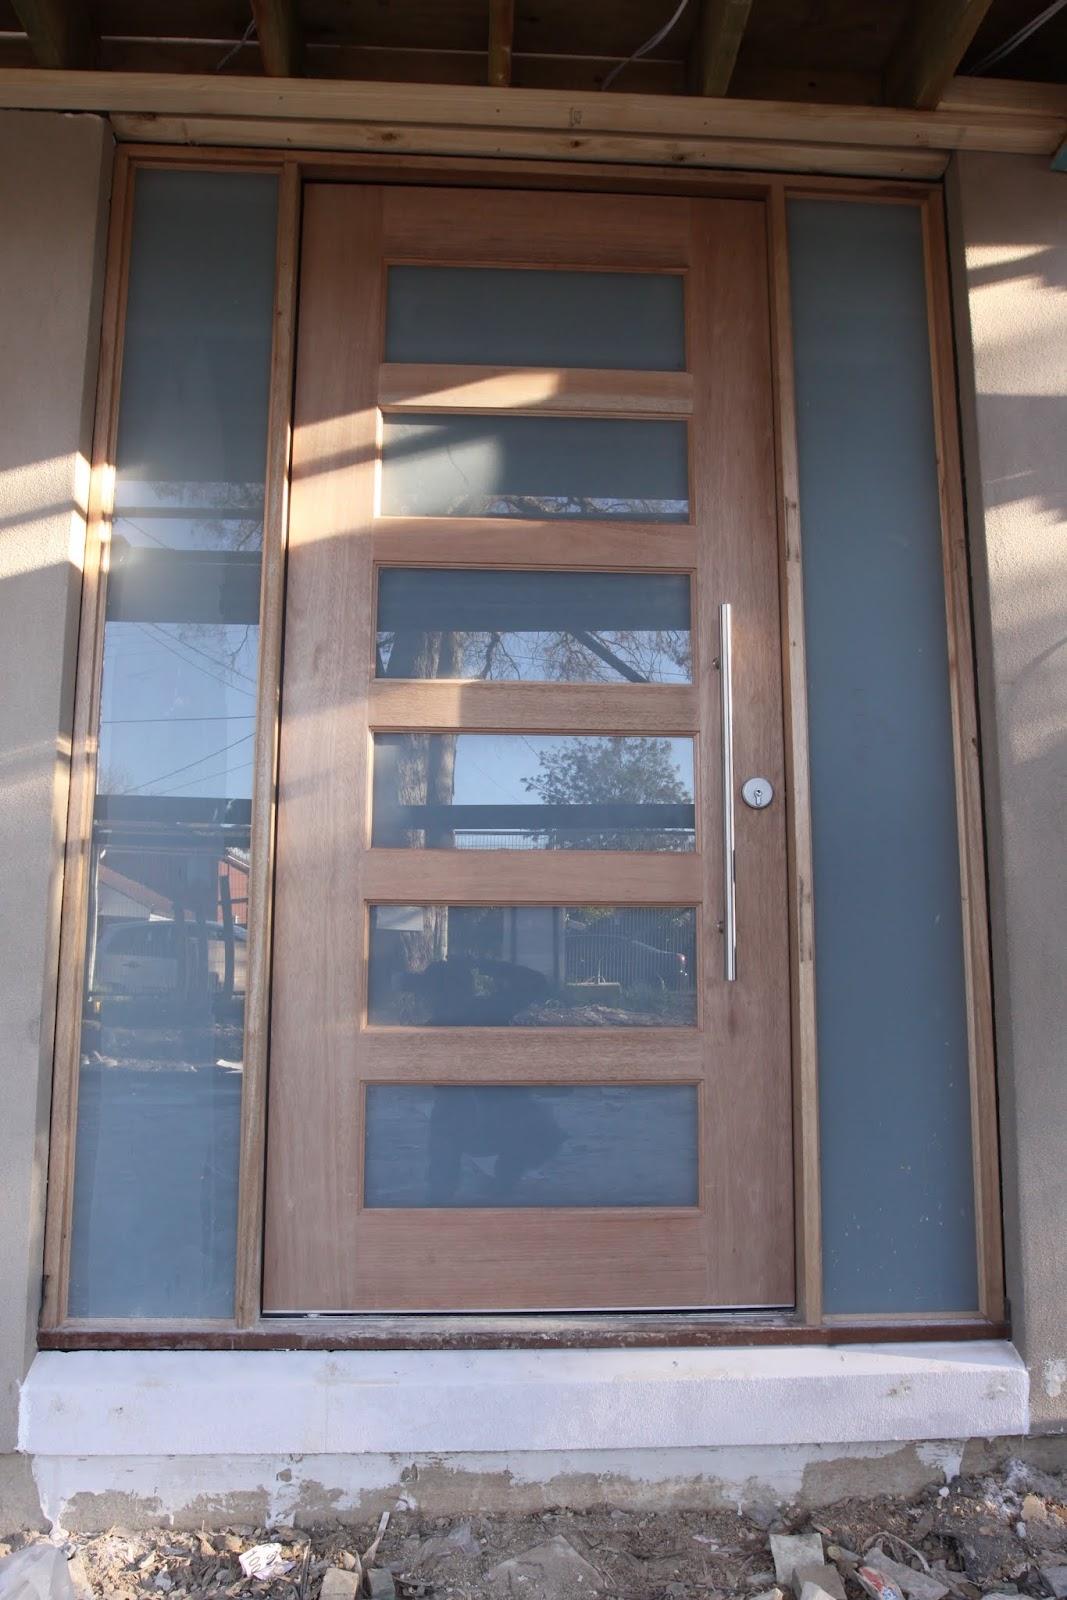 Our metricon nolan 41 journey kitchen and vanity cabinetry - Corinthian Windsor Winsws 6g Pivot Door